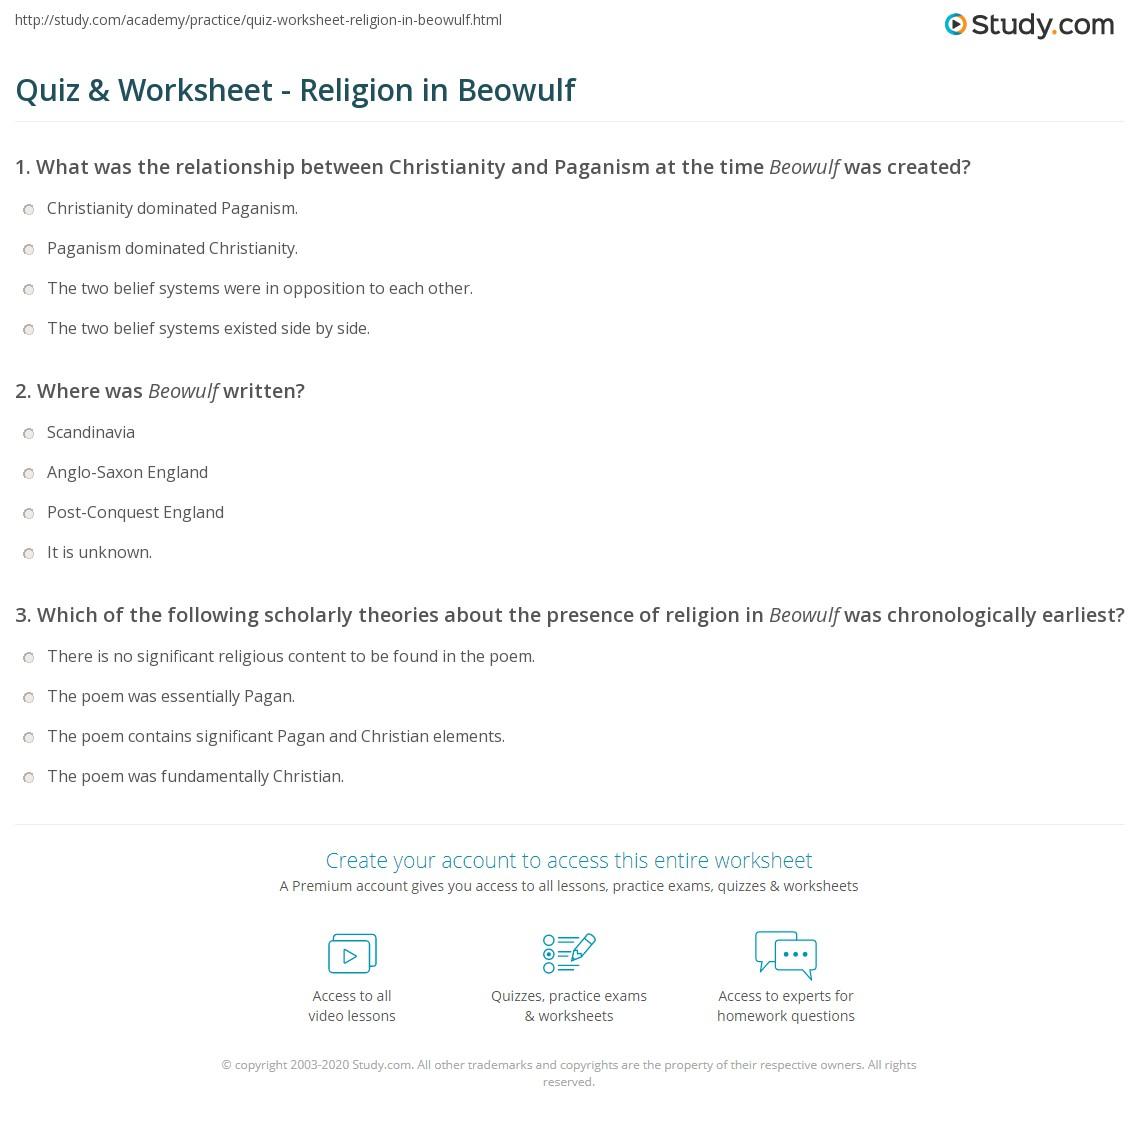 Quiz & Worksheet - Religion in Beowulf  Study.com worksheets for teachers, multiplication, grade worksheets, printable worksheets, and worksheets Anglo Saxon Worksheets 2 1410 x 1140